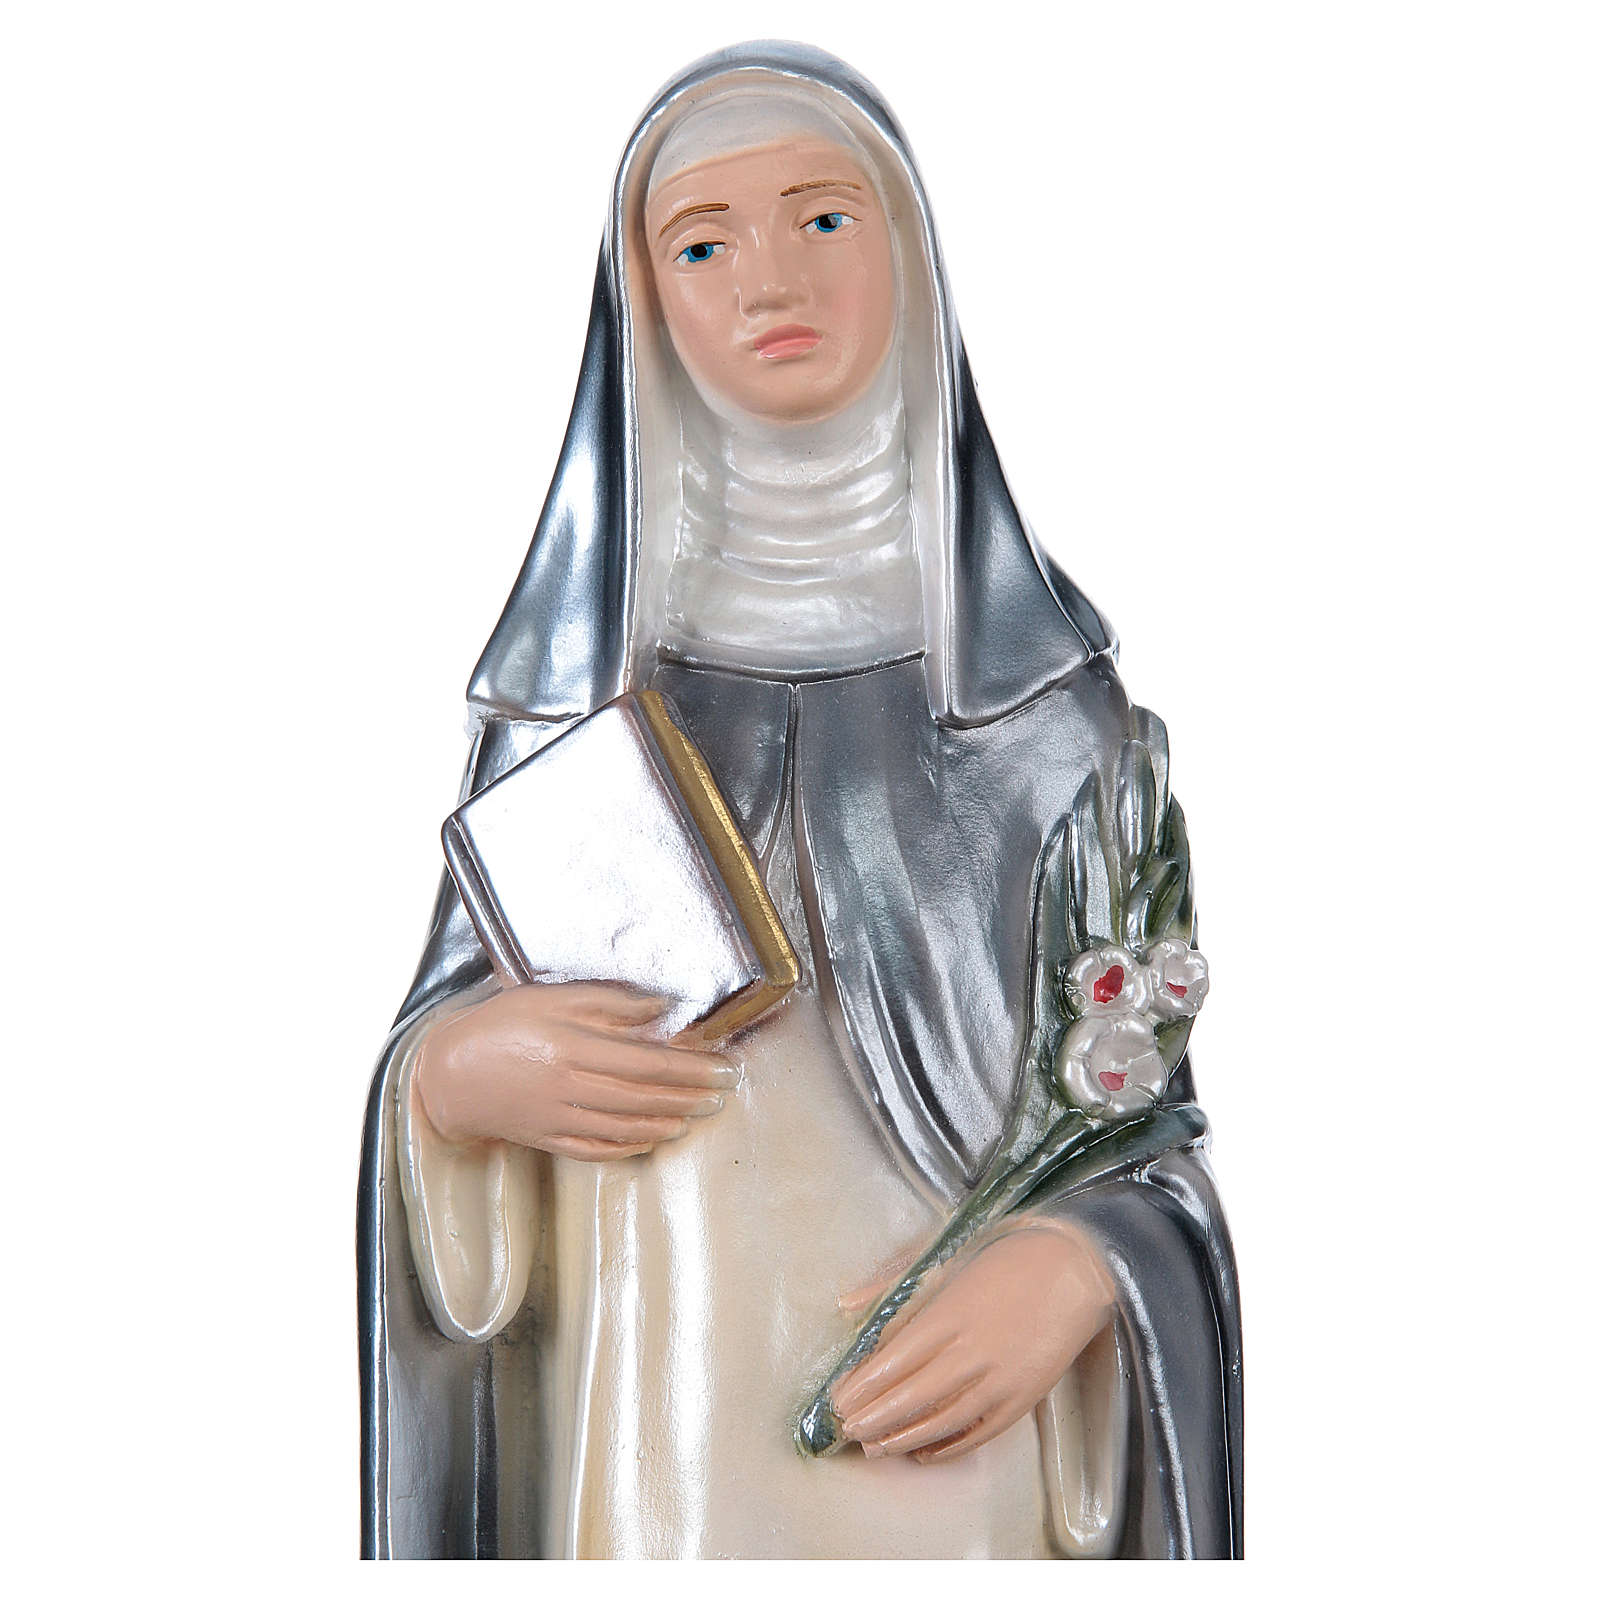 Statua gesso madreperlato Santa Caterina da Siena 30 cm 4